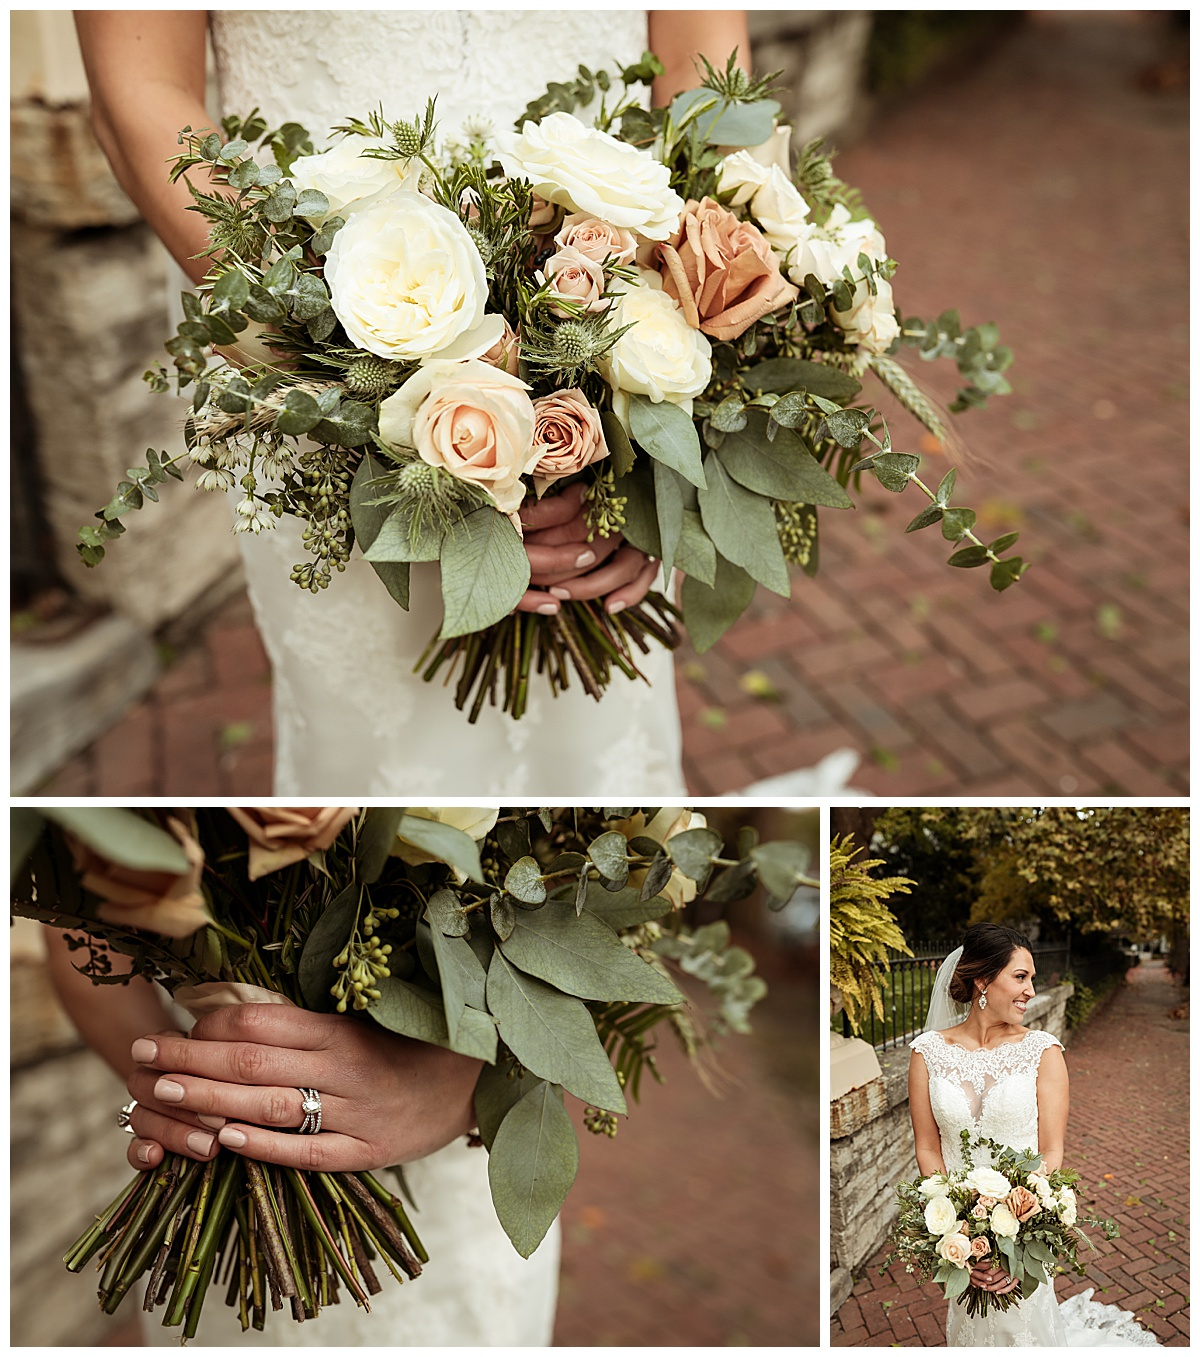 INDUSTRY_Indianapolis_Meghan Harrison Wedding Photography_0042.jpg